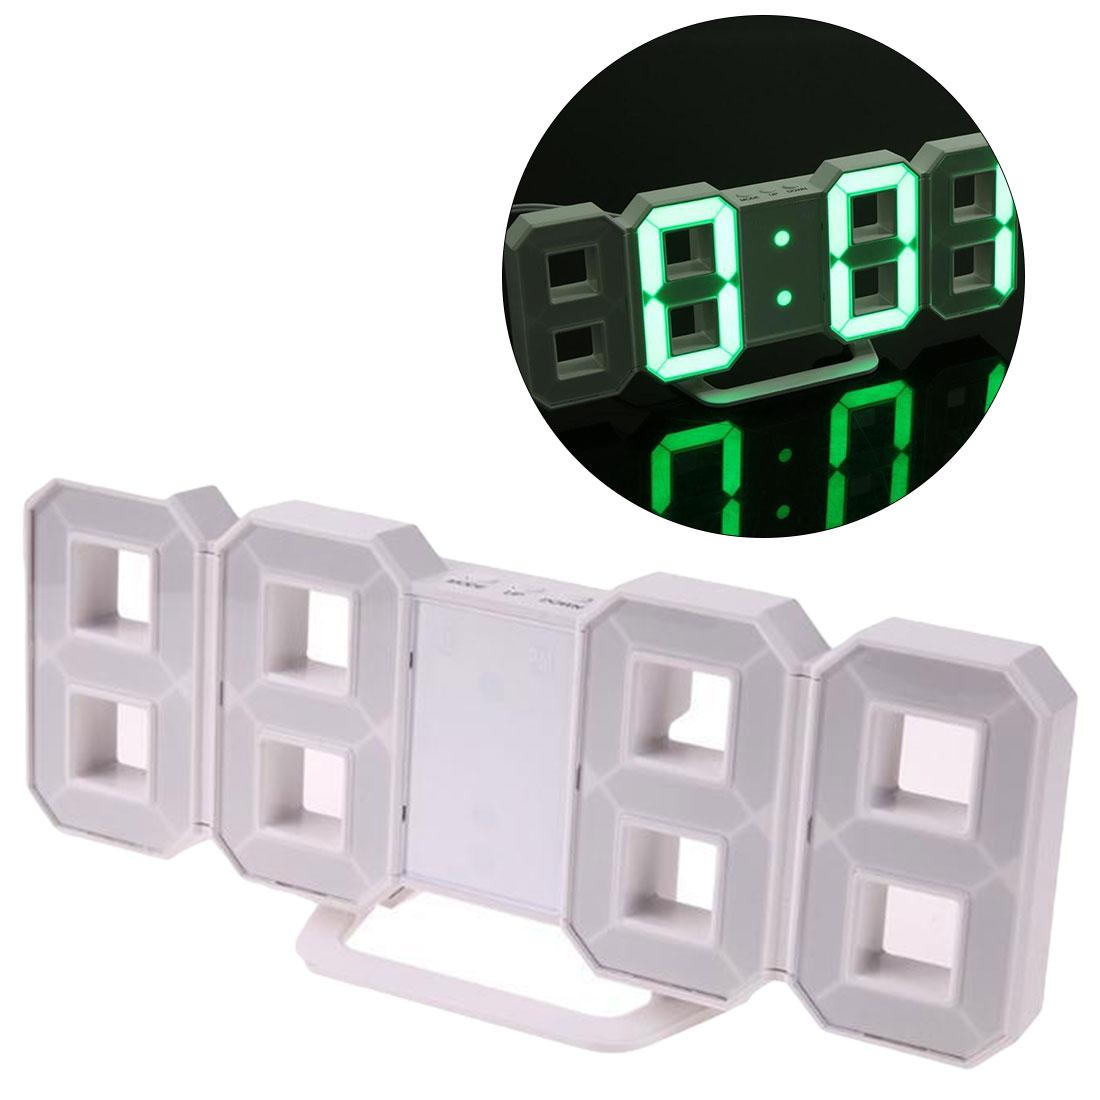 Digital LED Table Clock Watches 24 Or 12-Hour Display Mechanism Alarm Snooze Desk Clock Modern Wall Clock